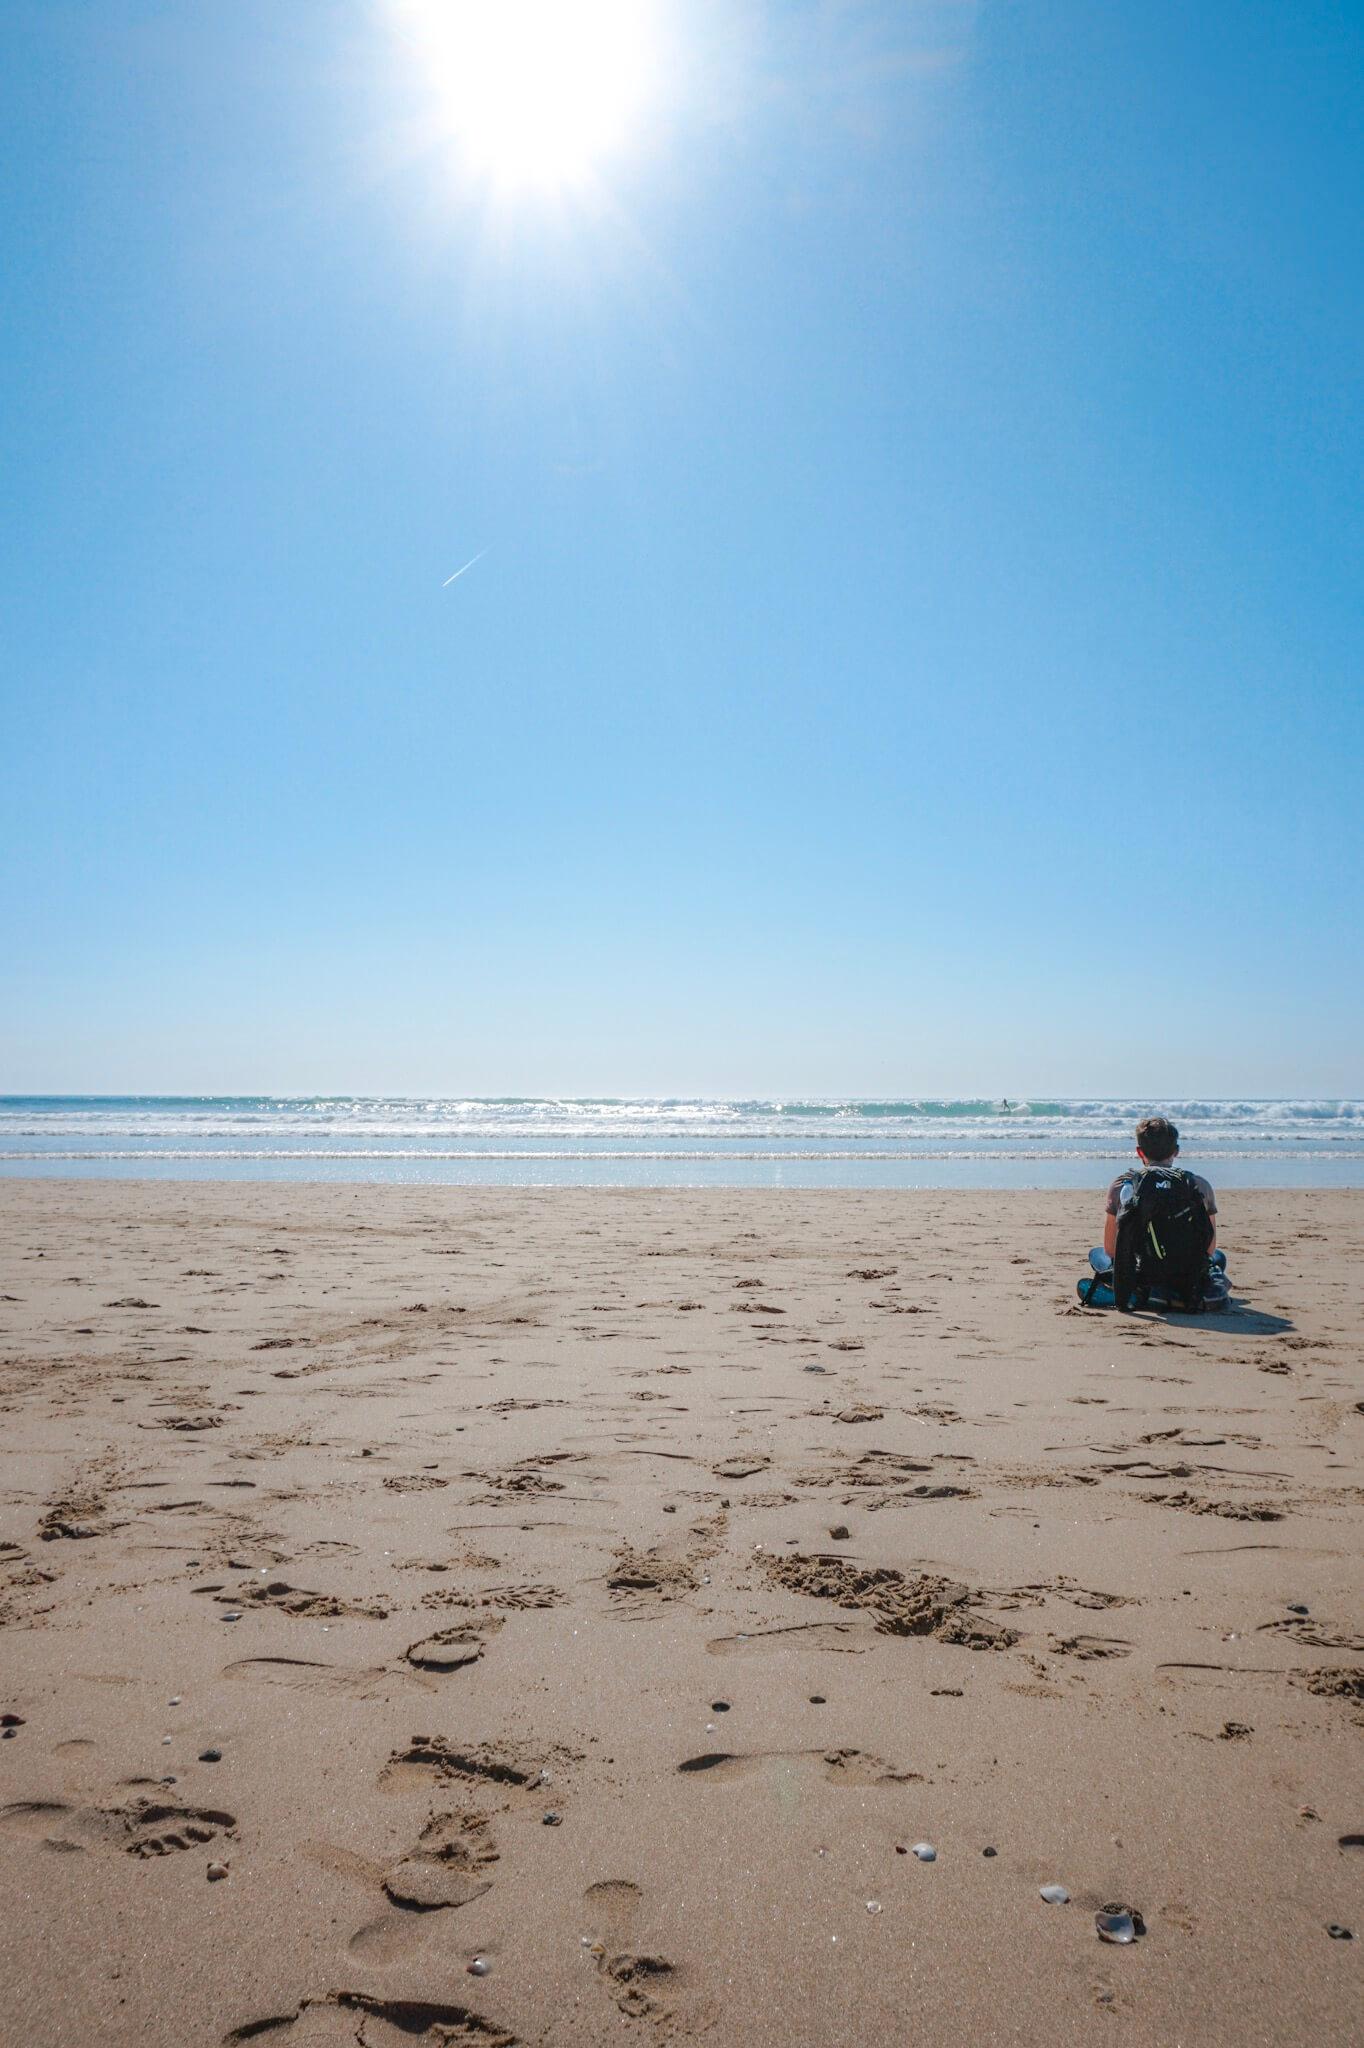 plage de lisbonne costa caparica